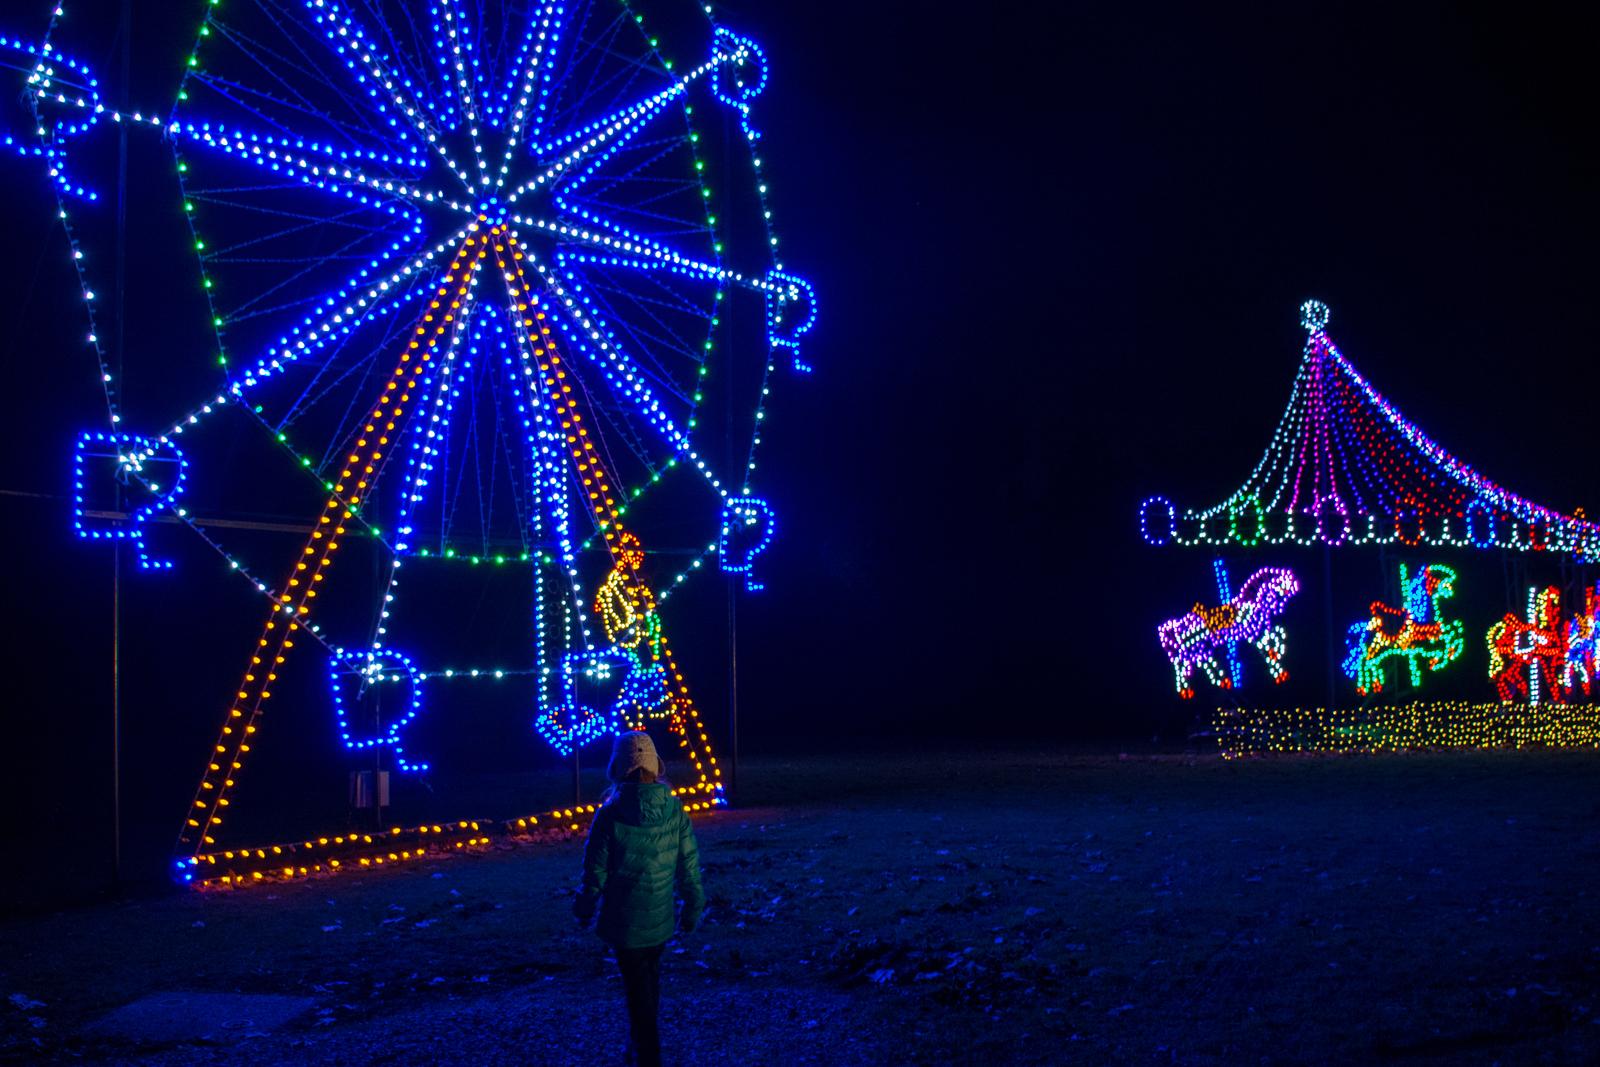 nearby hotel deals - Oglebay Park Christmas Lights